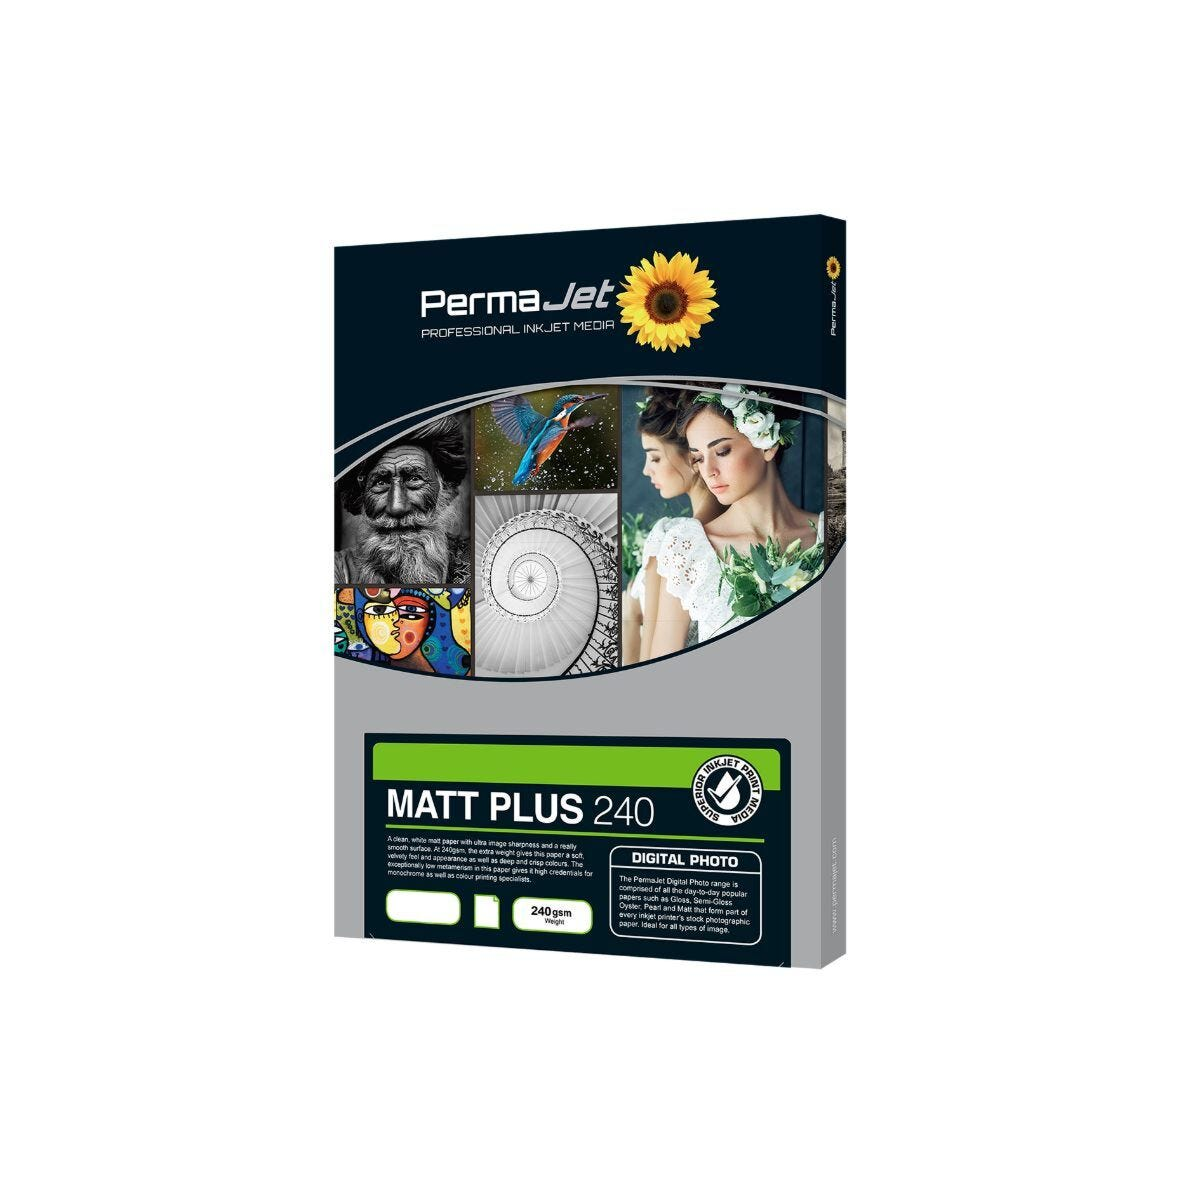 PermaJet Matt Plus 240 Paper A3 25 Sheets